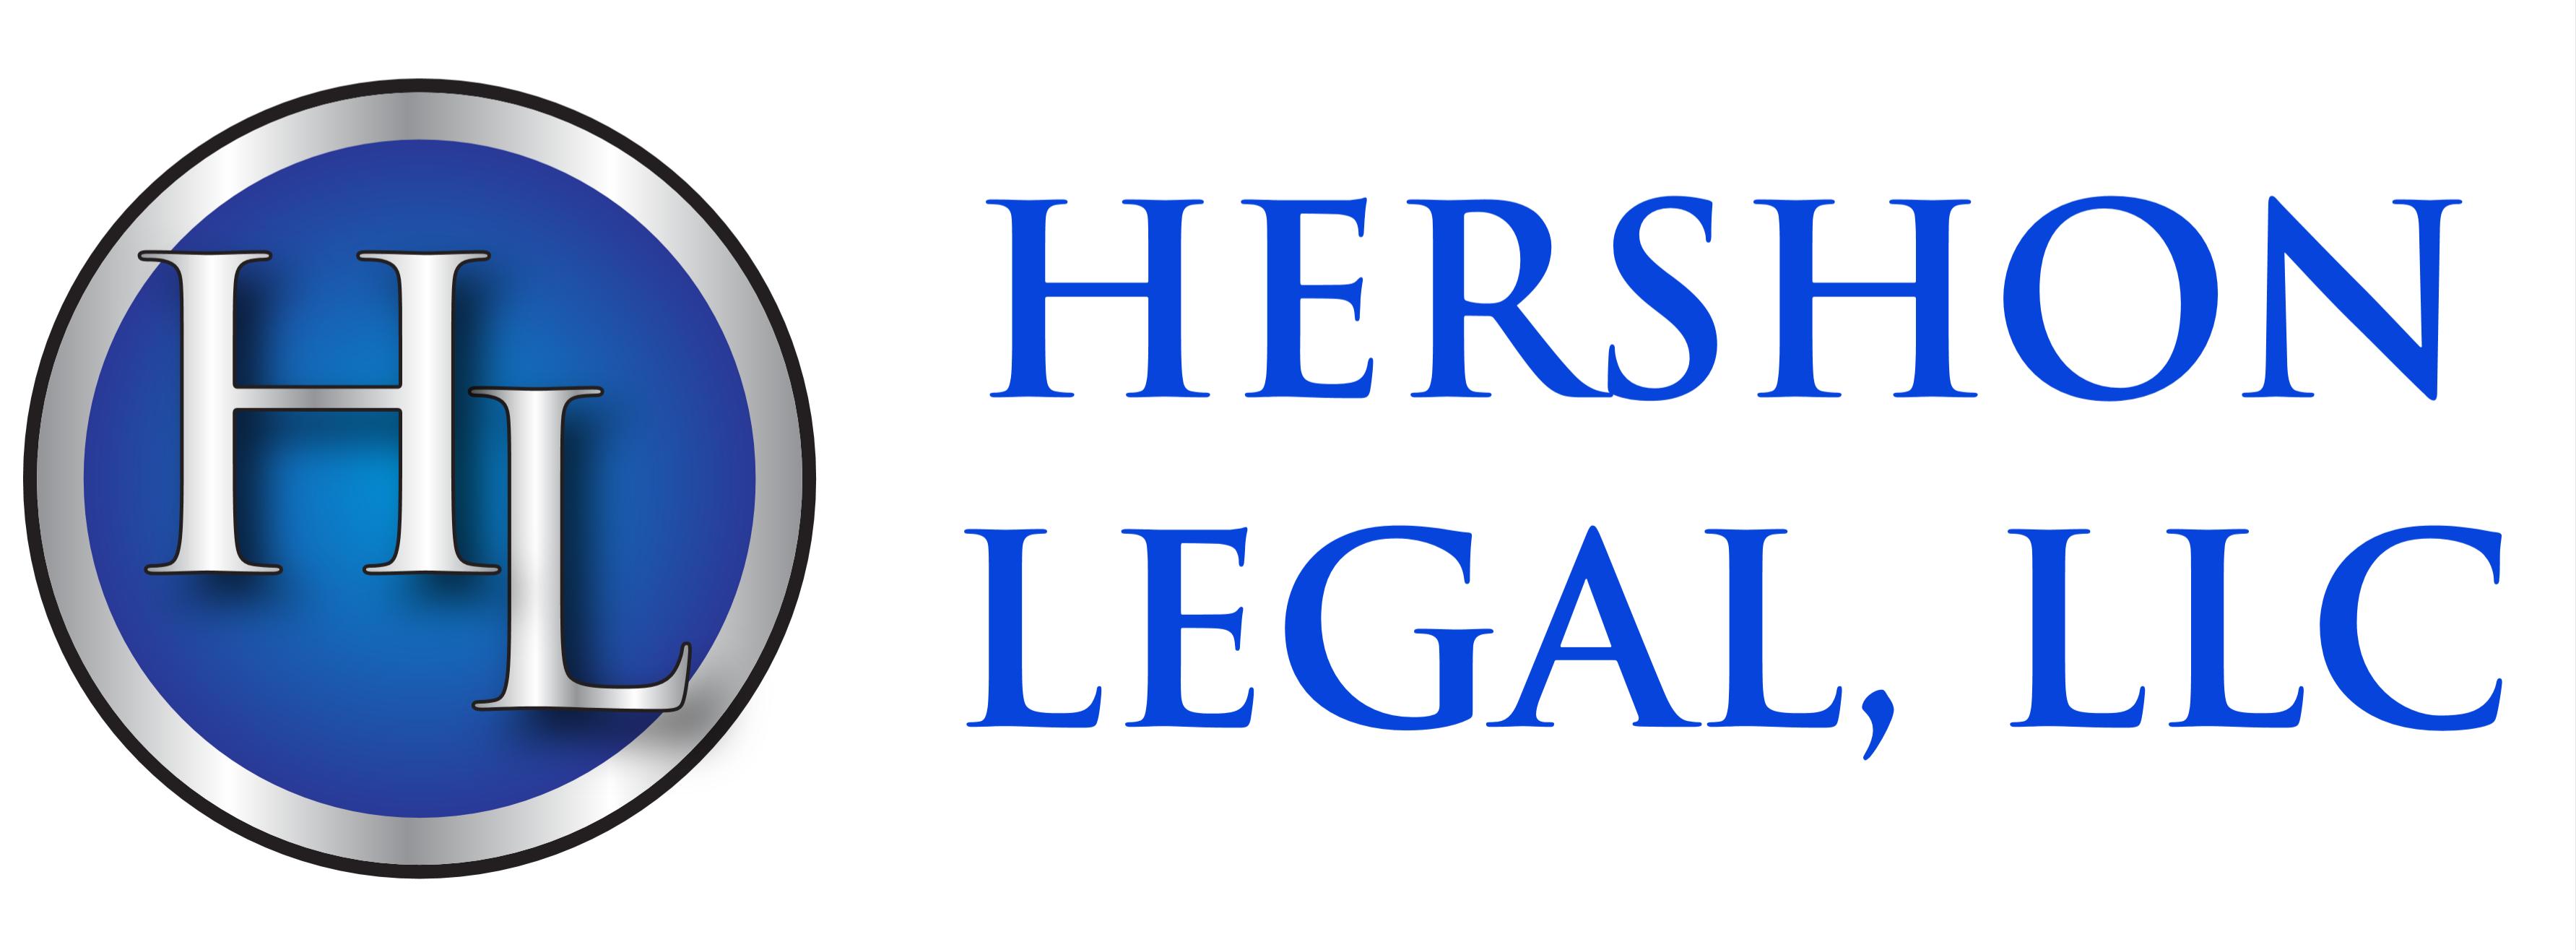 Hershon Legal, LLC logo